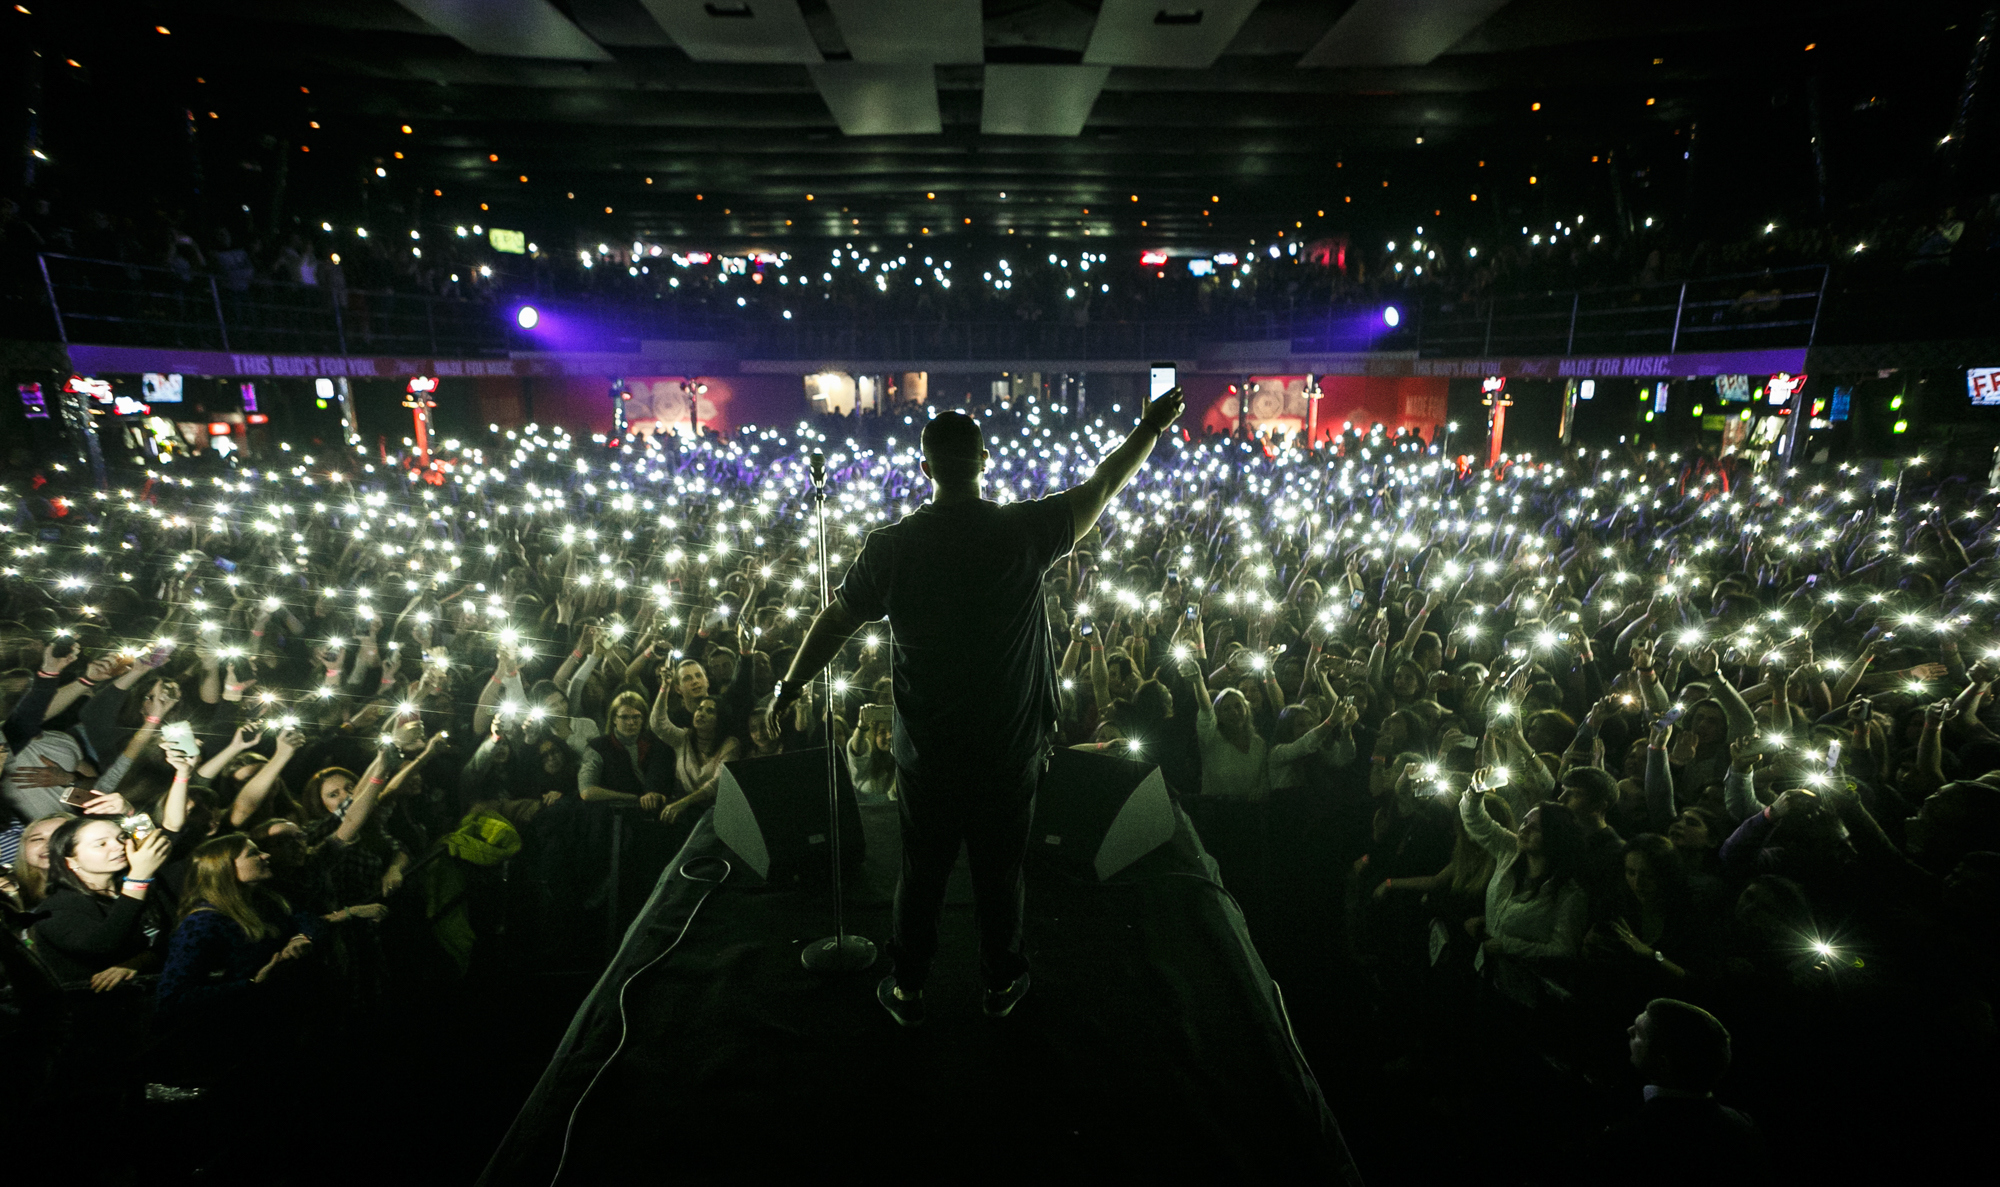 Concert - Jah Kalib